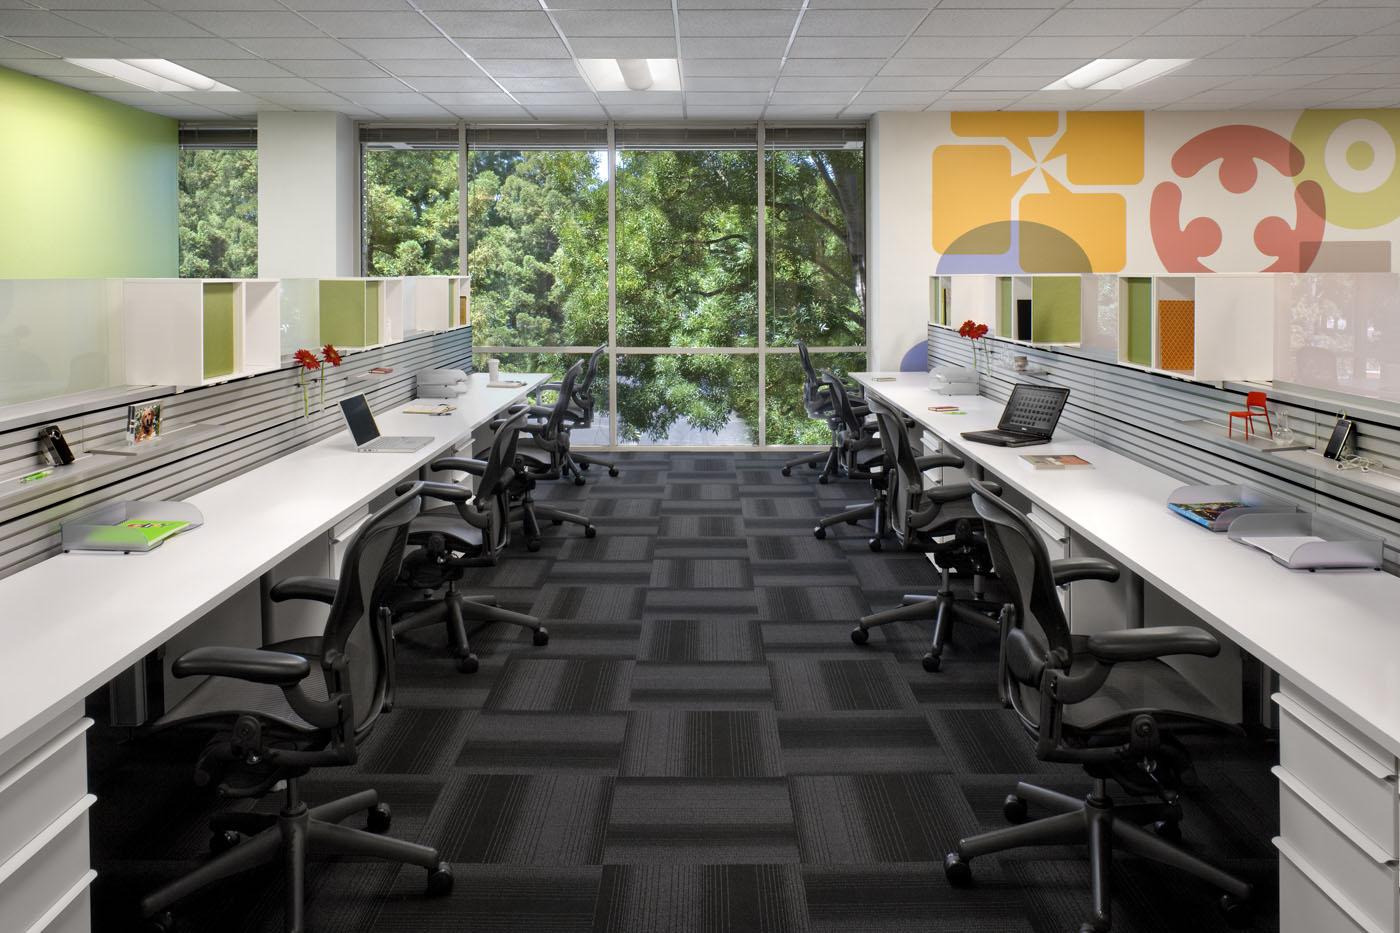 ebay office ebay workplace initiative by valerio dewalt train associates karmatrendz acm ad agency charlotte nc office wall